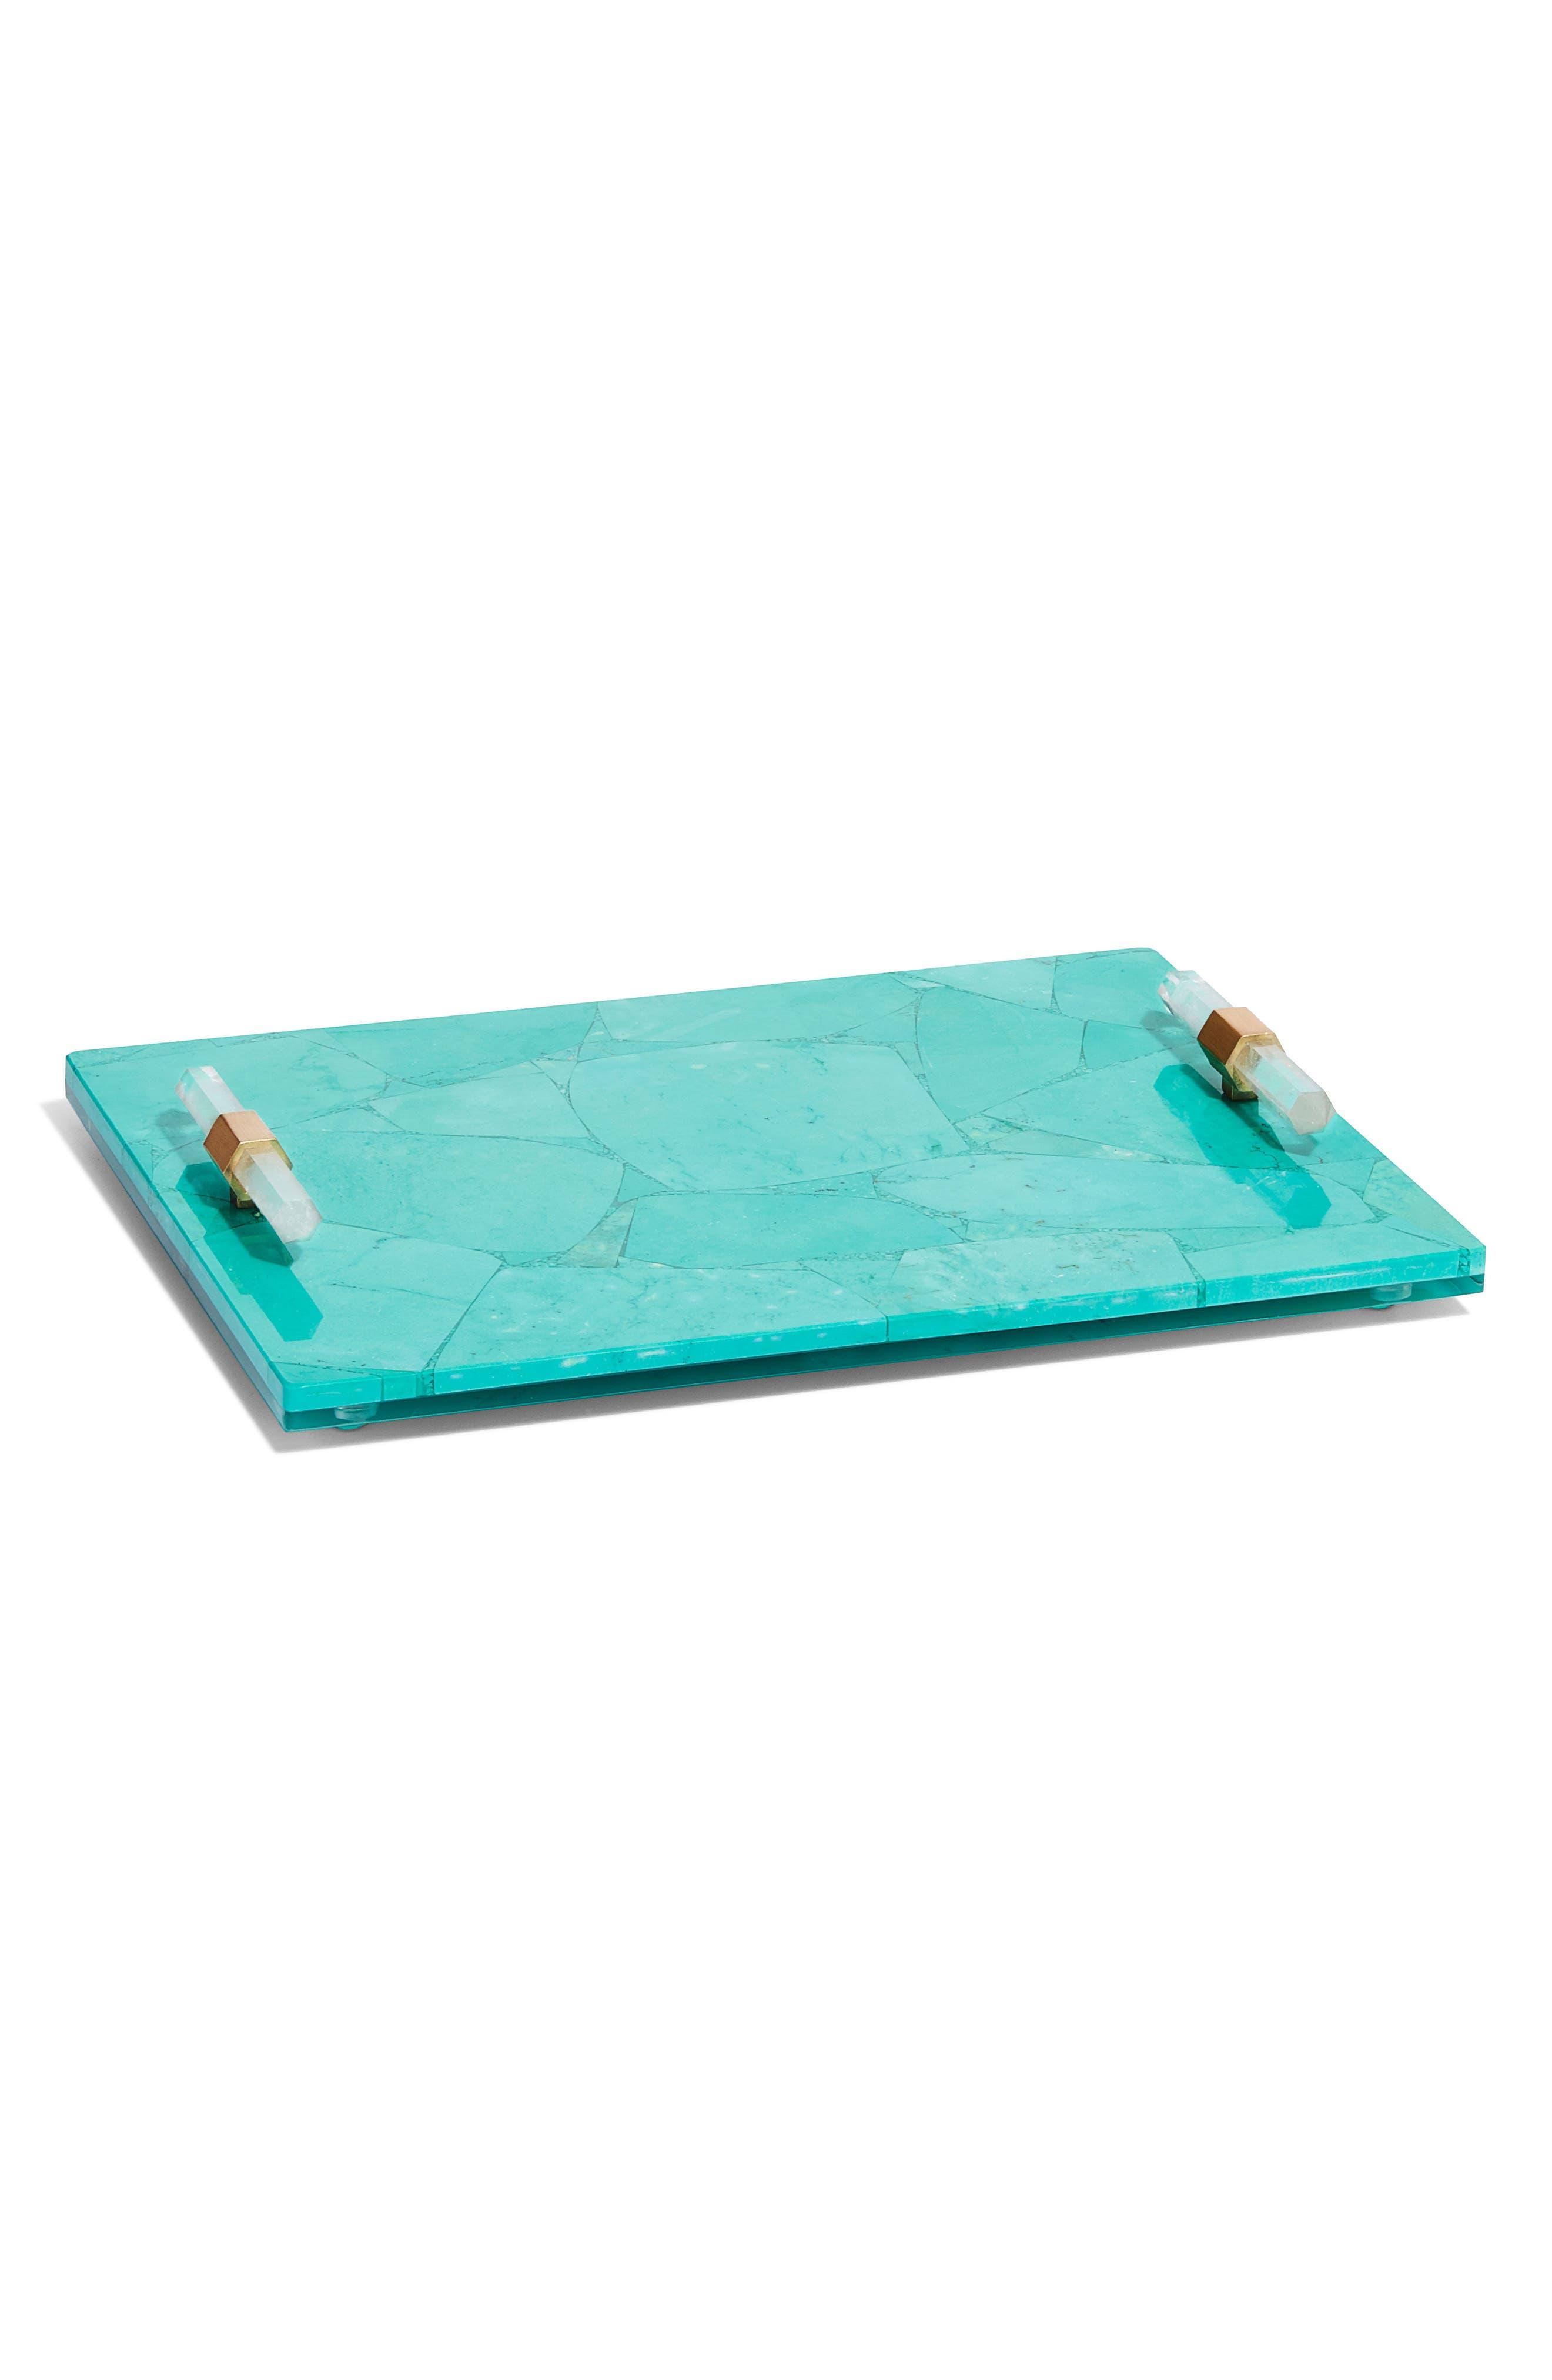 Kendra Scott Small Stone Slab Tray